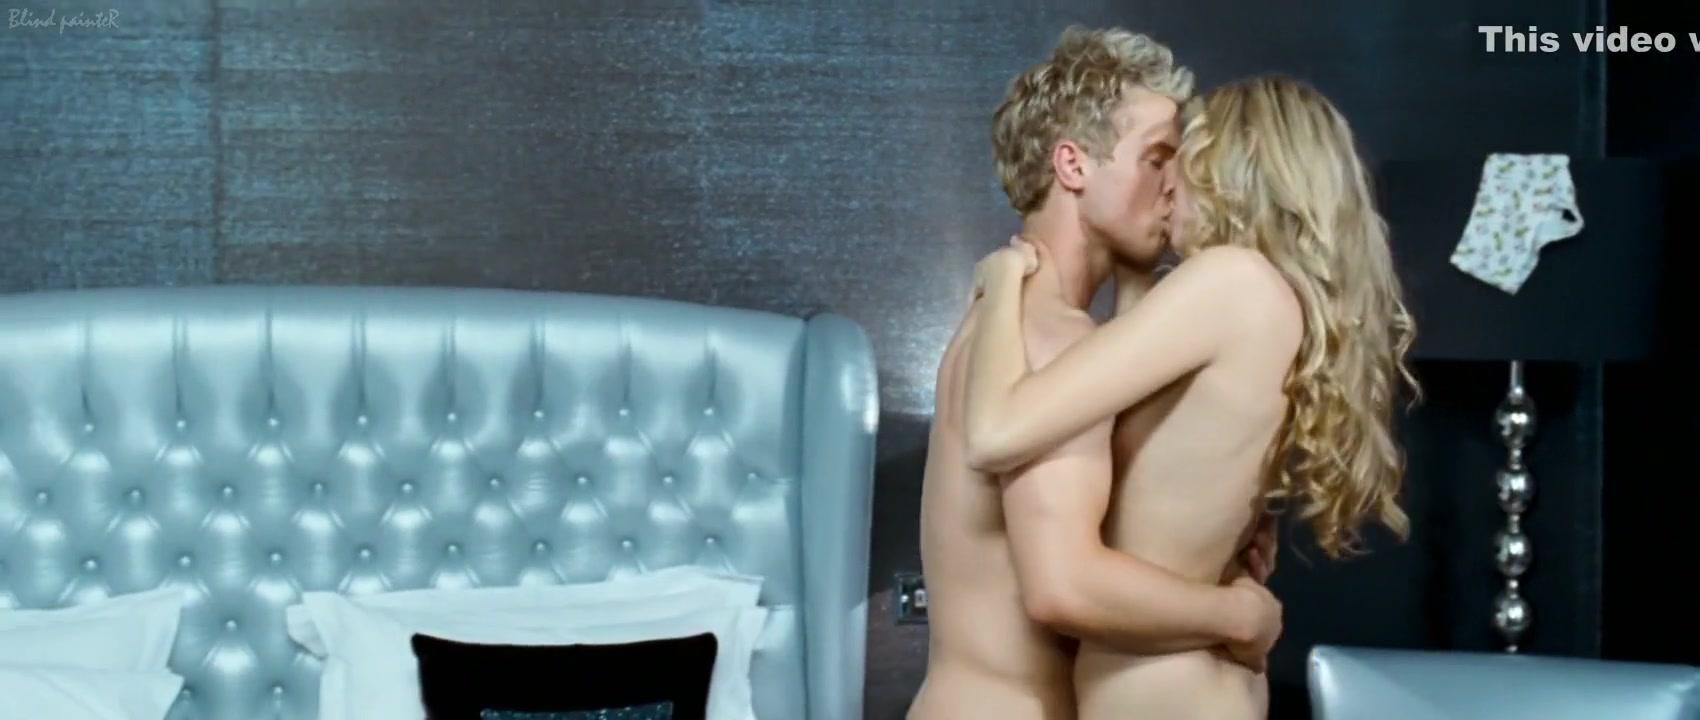 Tonton aduh sayang online dating Nude Photo Galleries